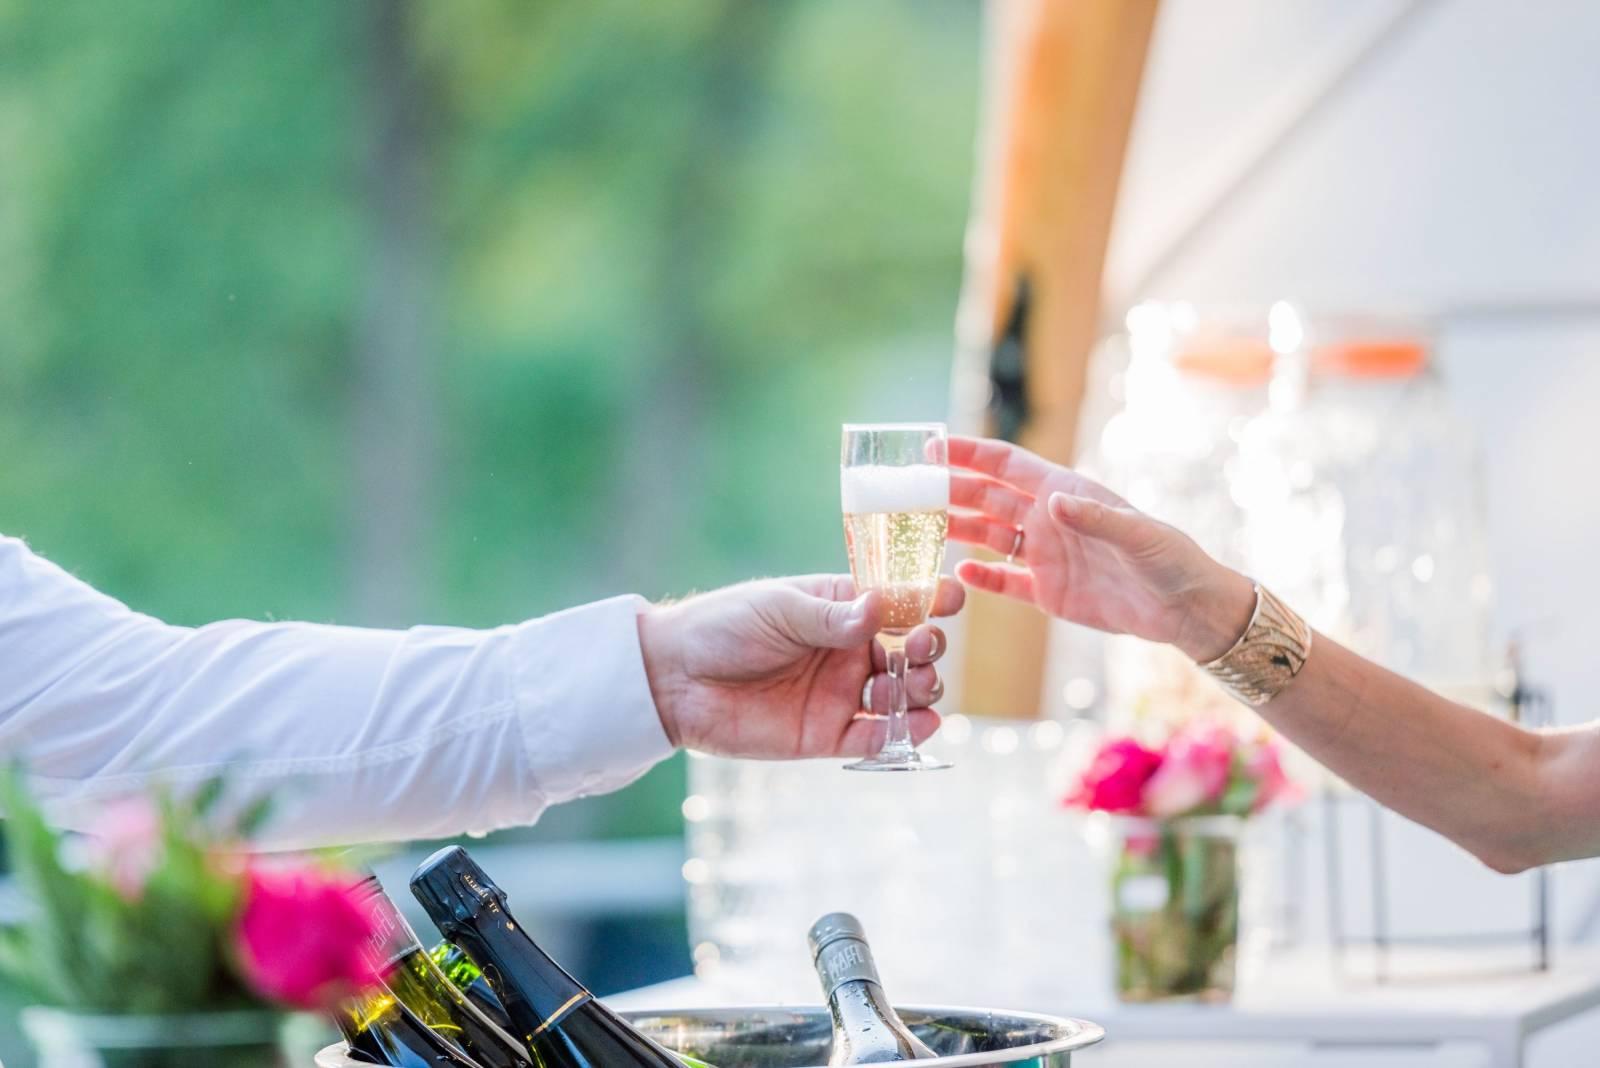 Collage - Biorganic - Catering - Cateraar - Traiteur - Biologisch - House of Weddings - 14